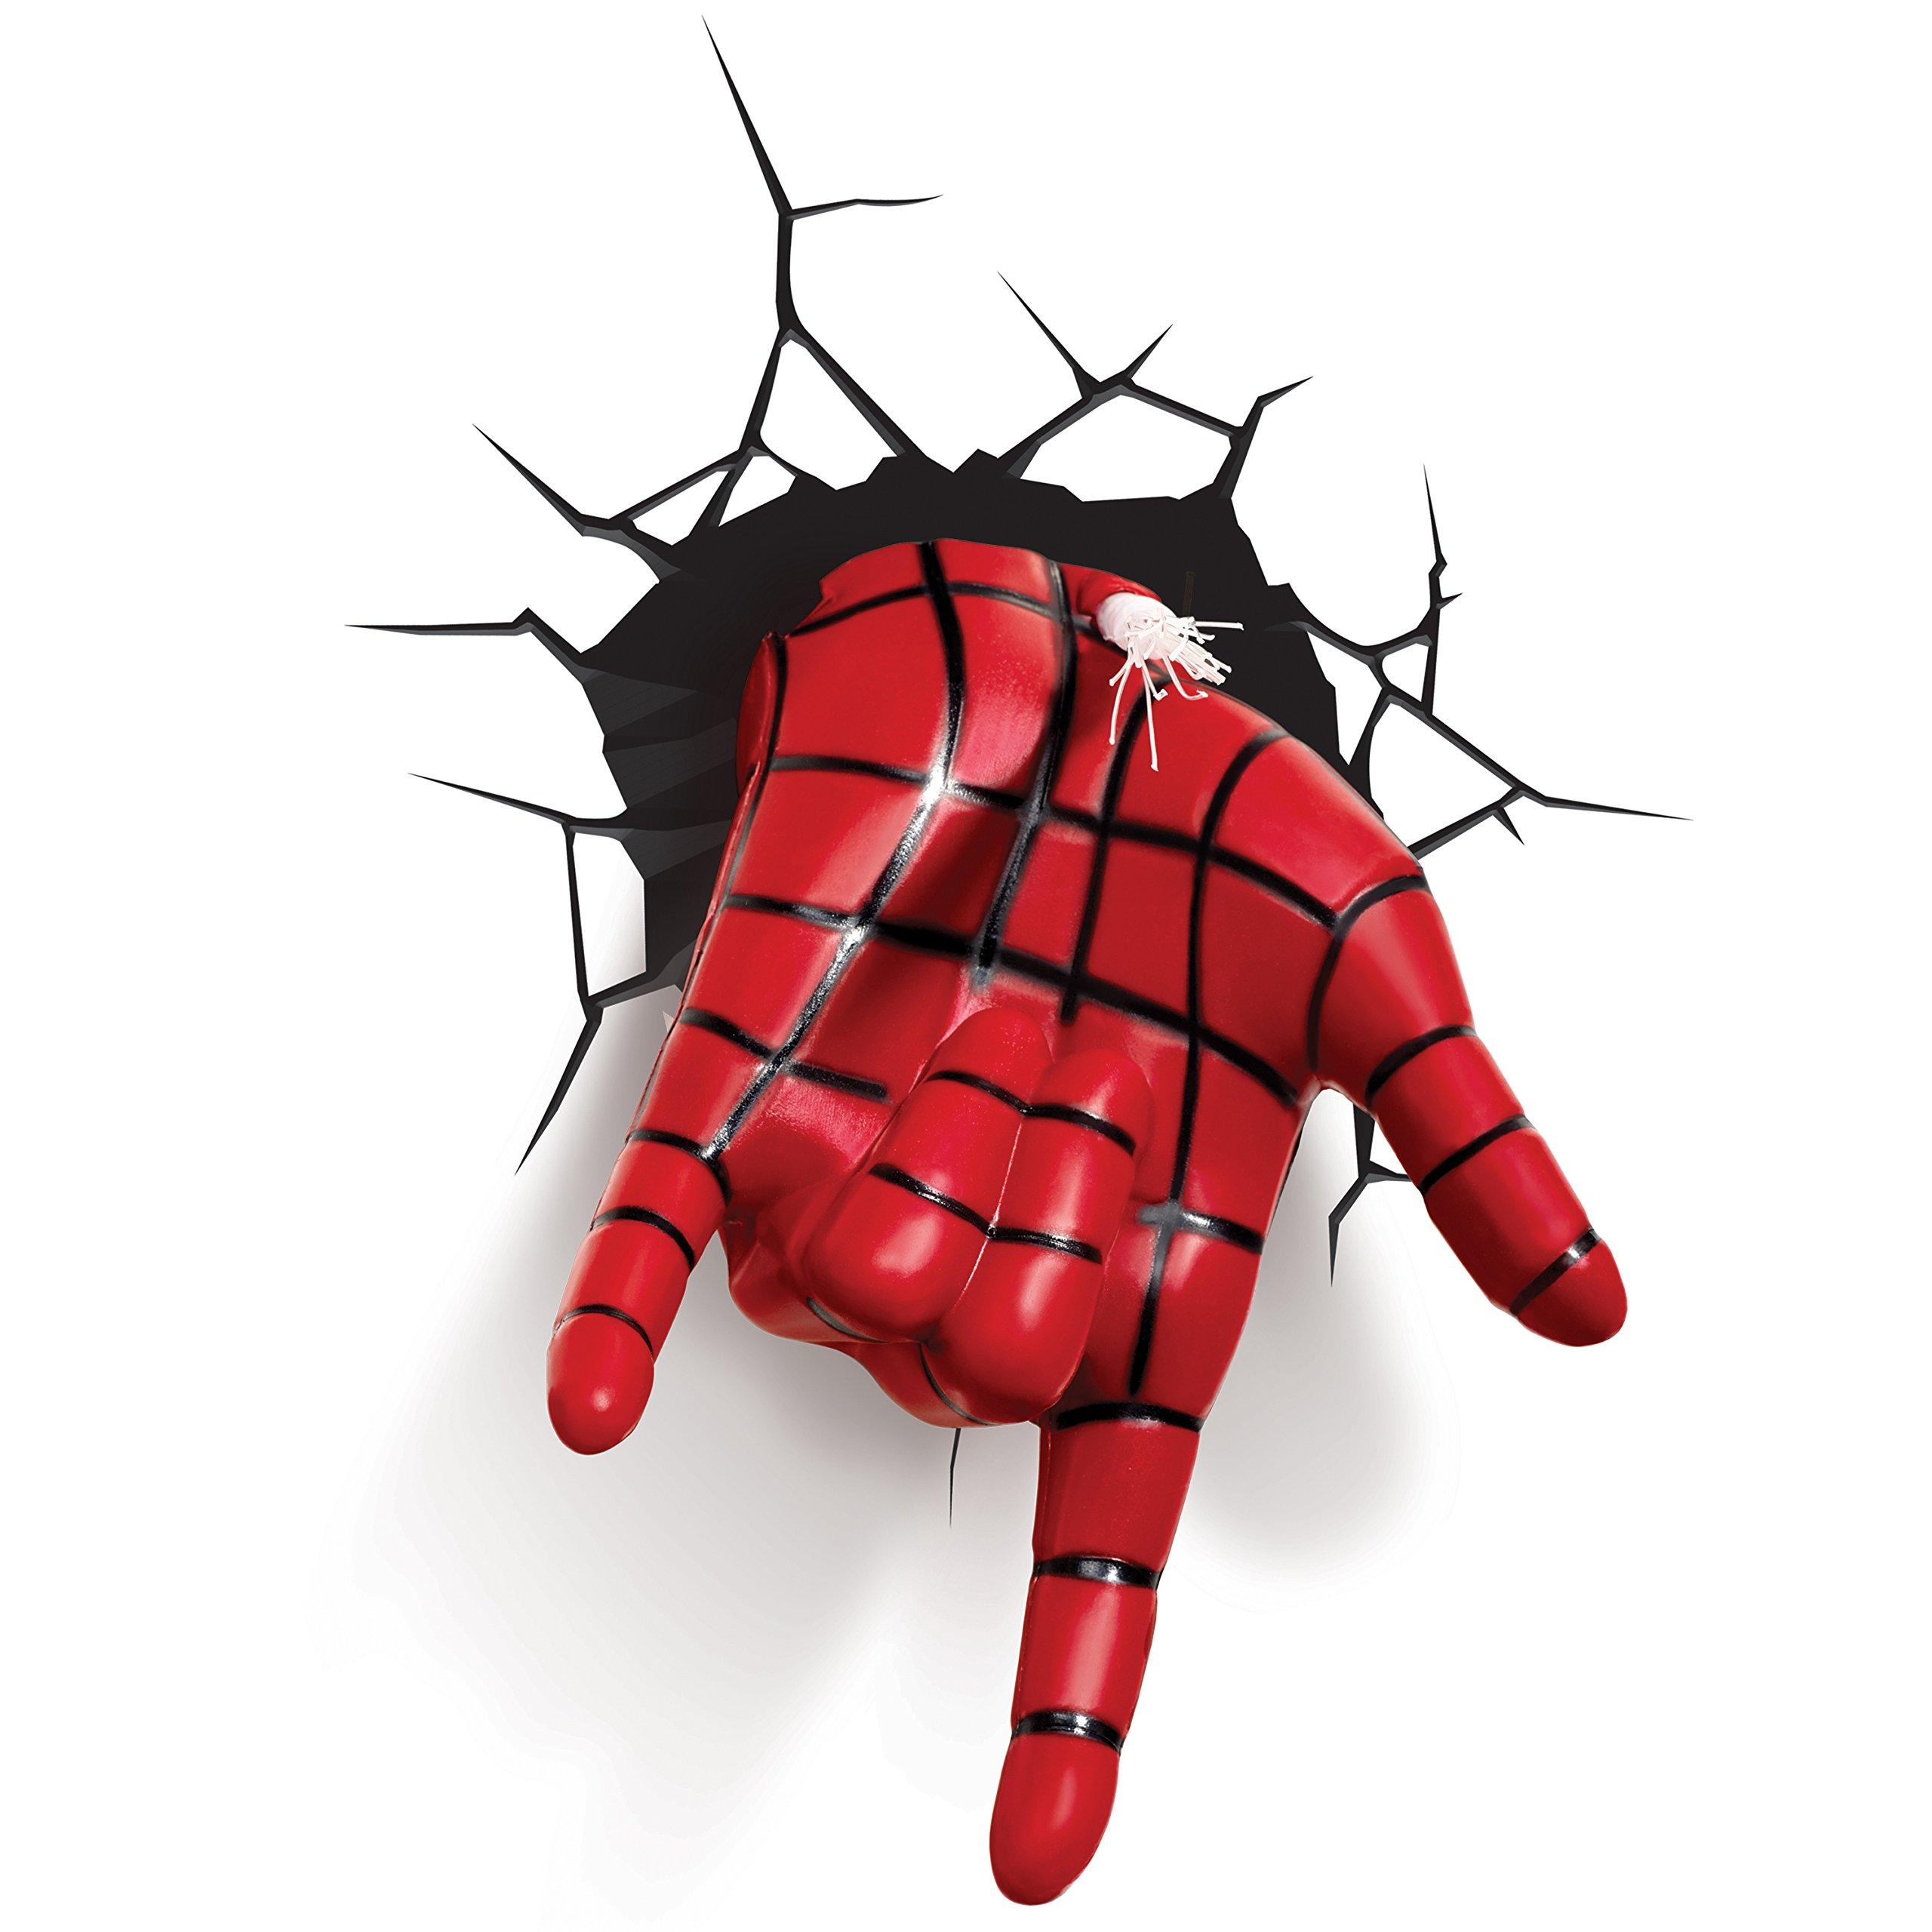 3D light FX Marvel Spiderman Hand 3D Deco LED Wall Light by 3D light FX